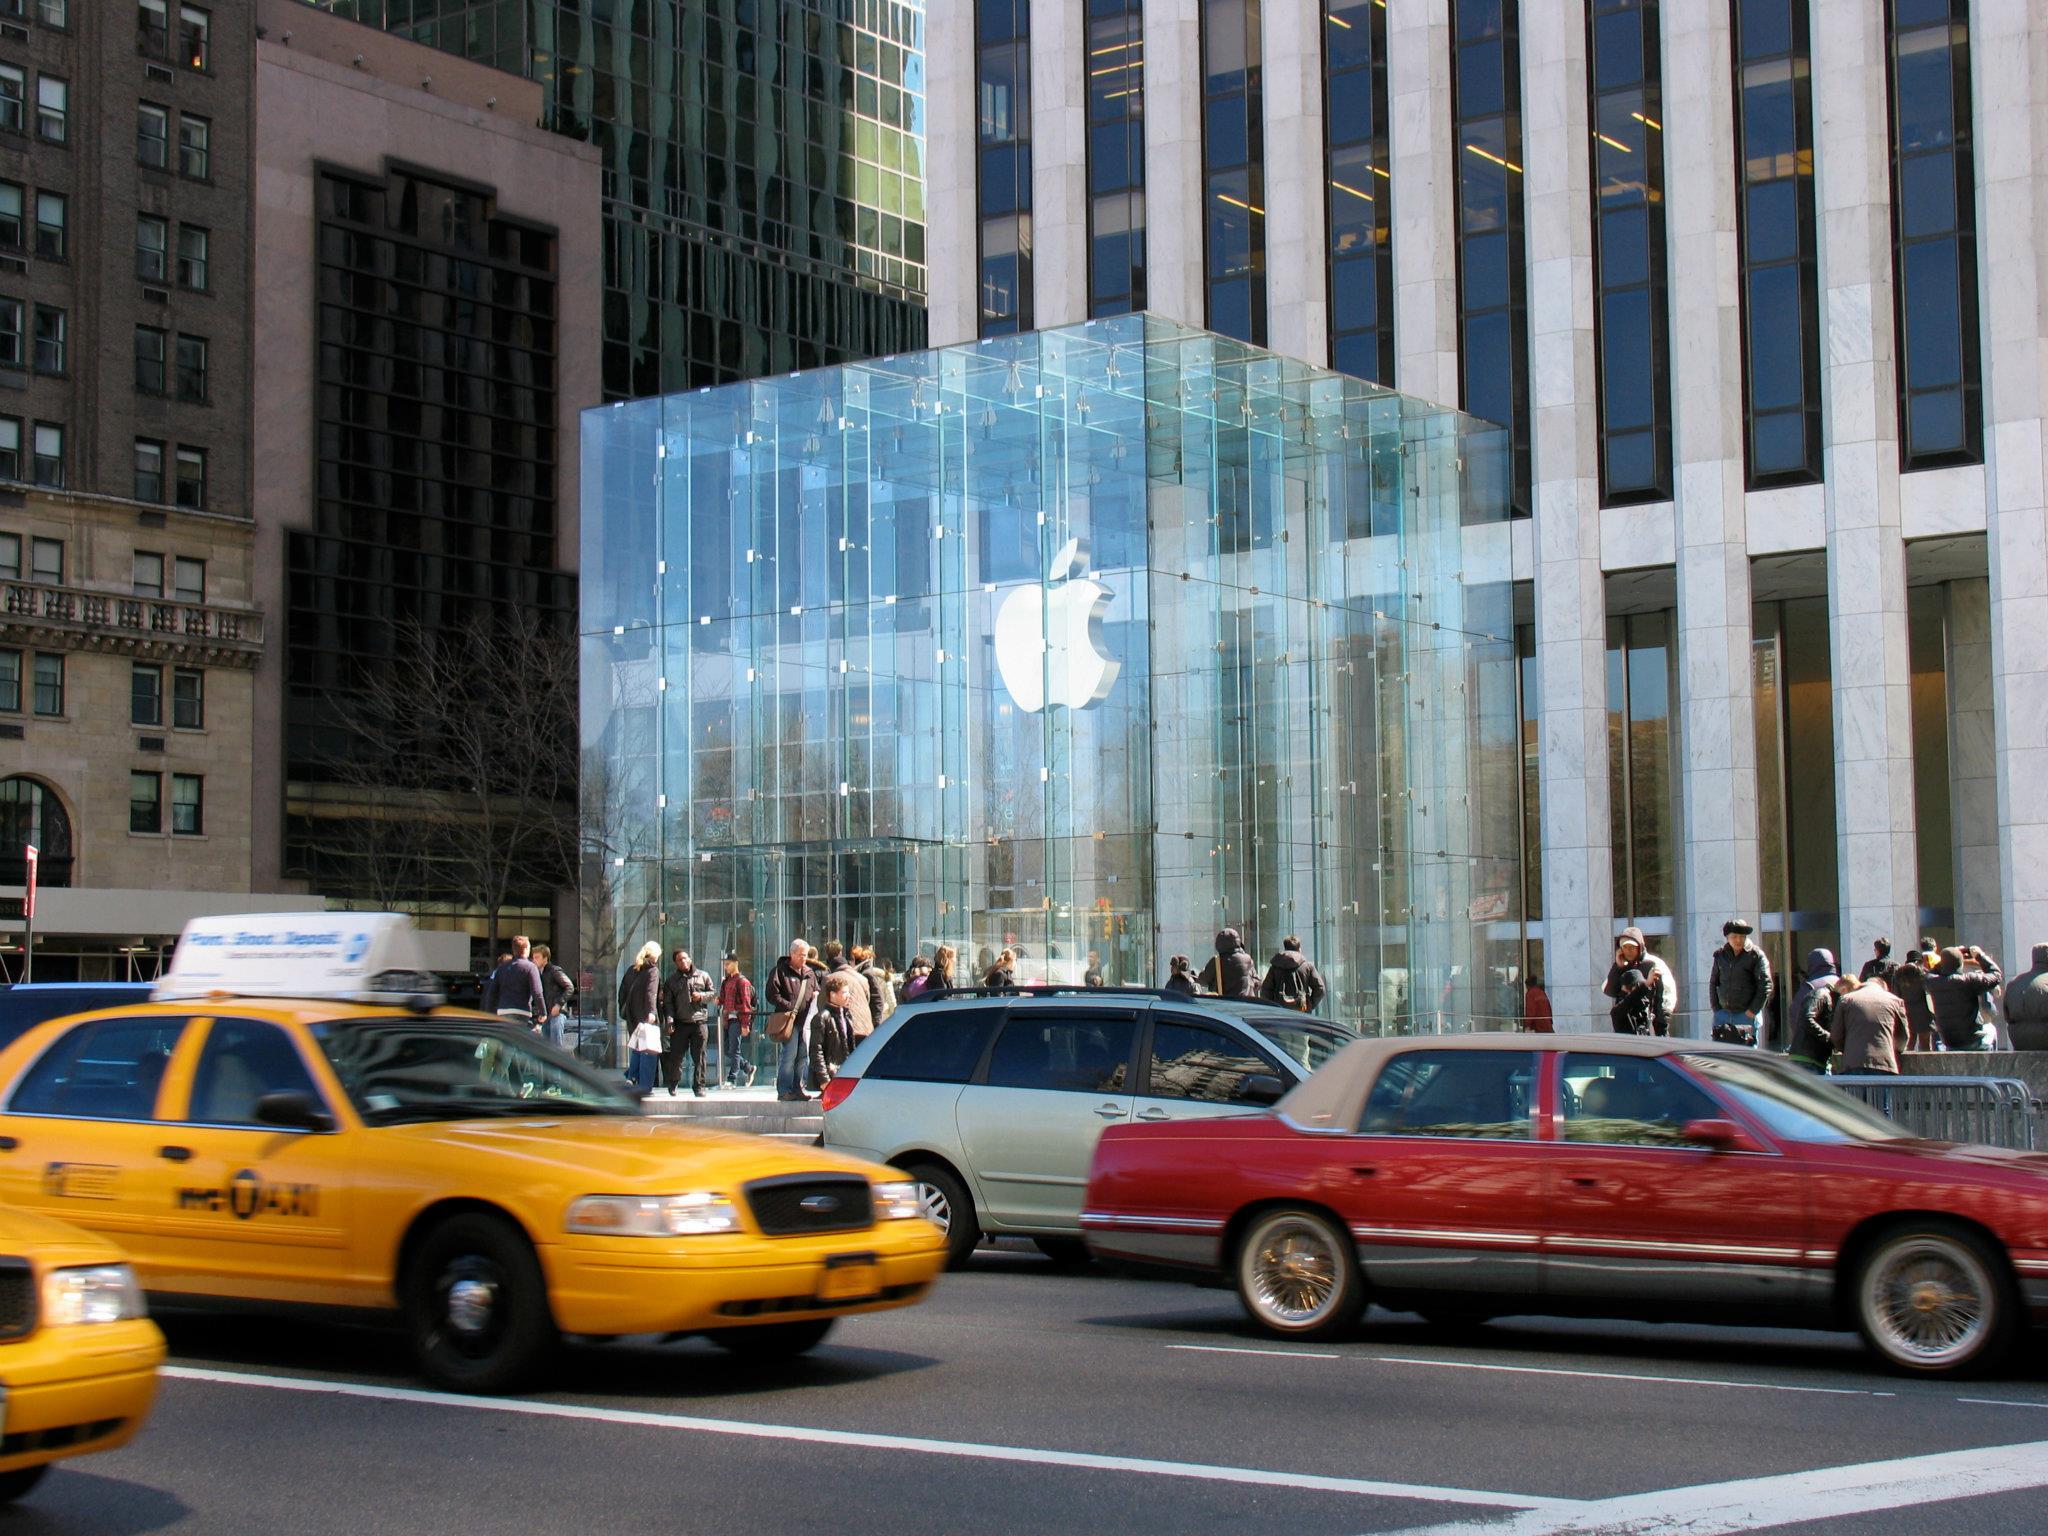 Apple Store traffic 5th Ave NYC.jpg